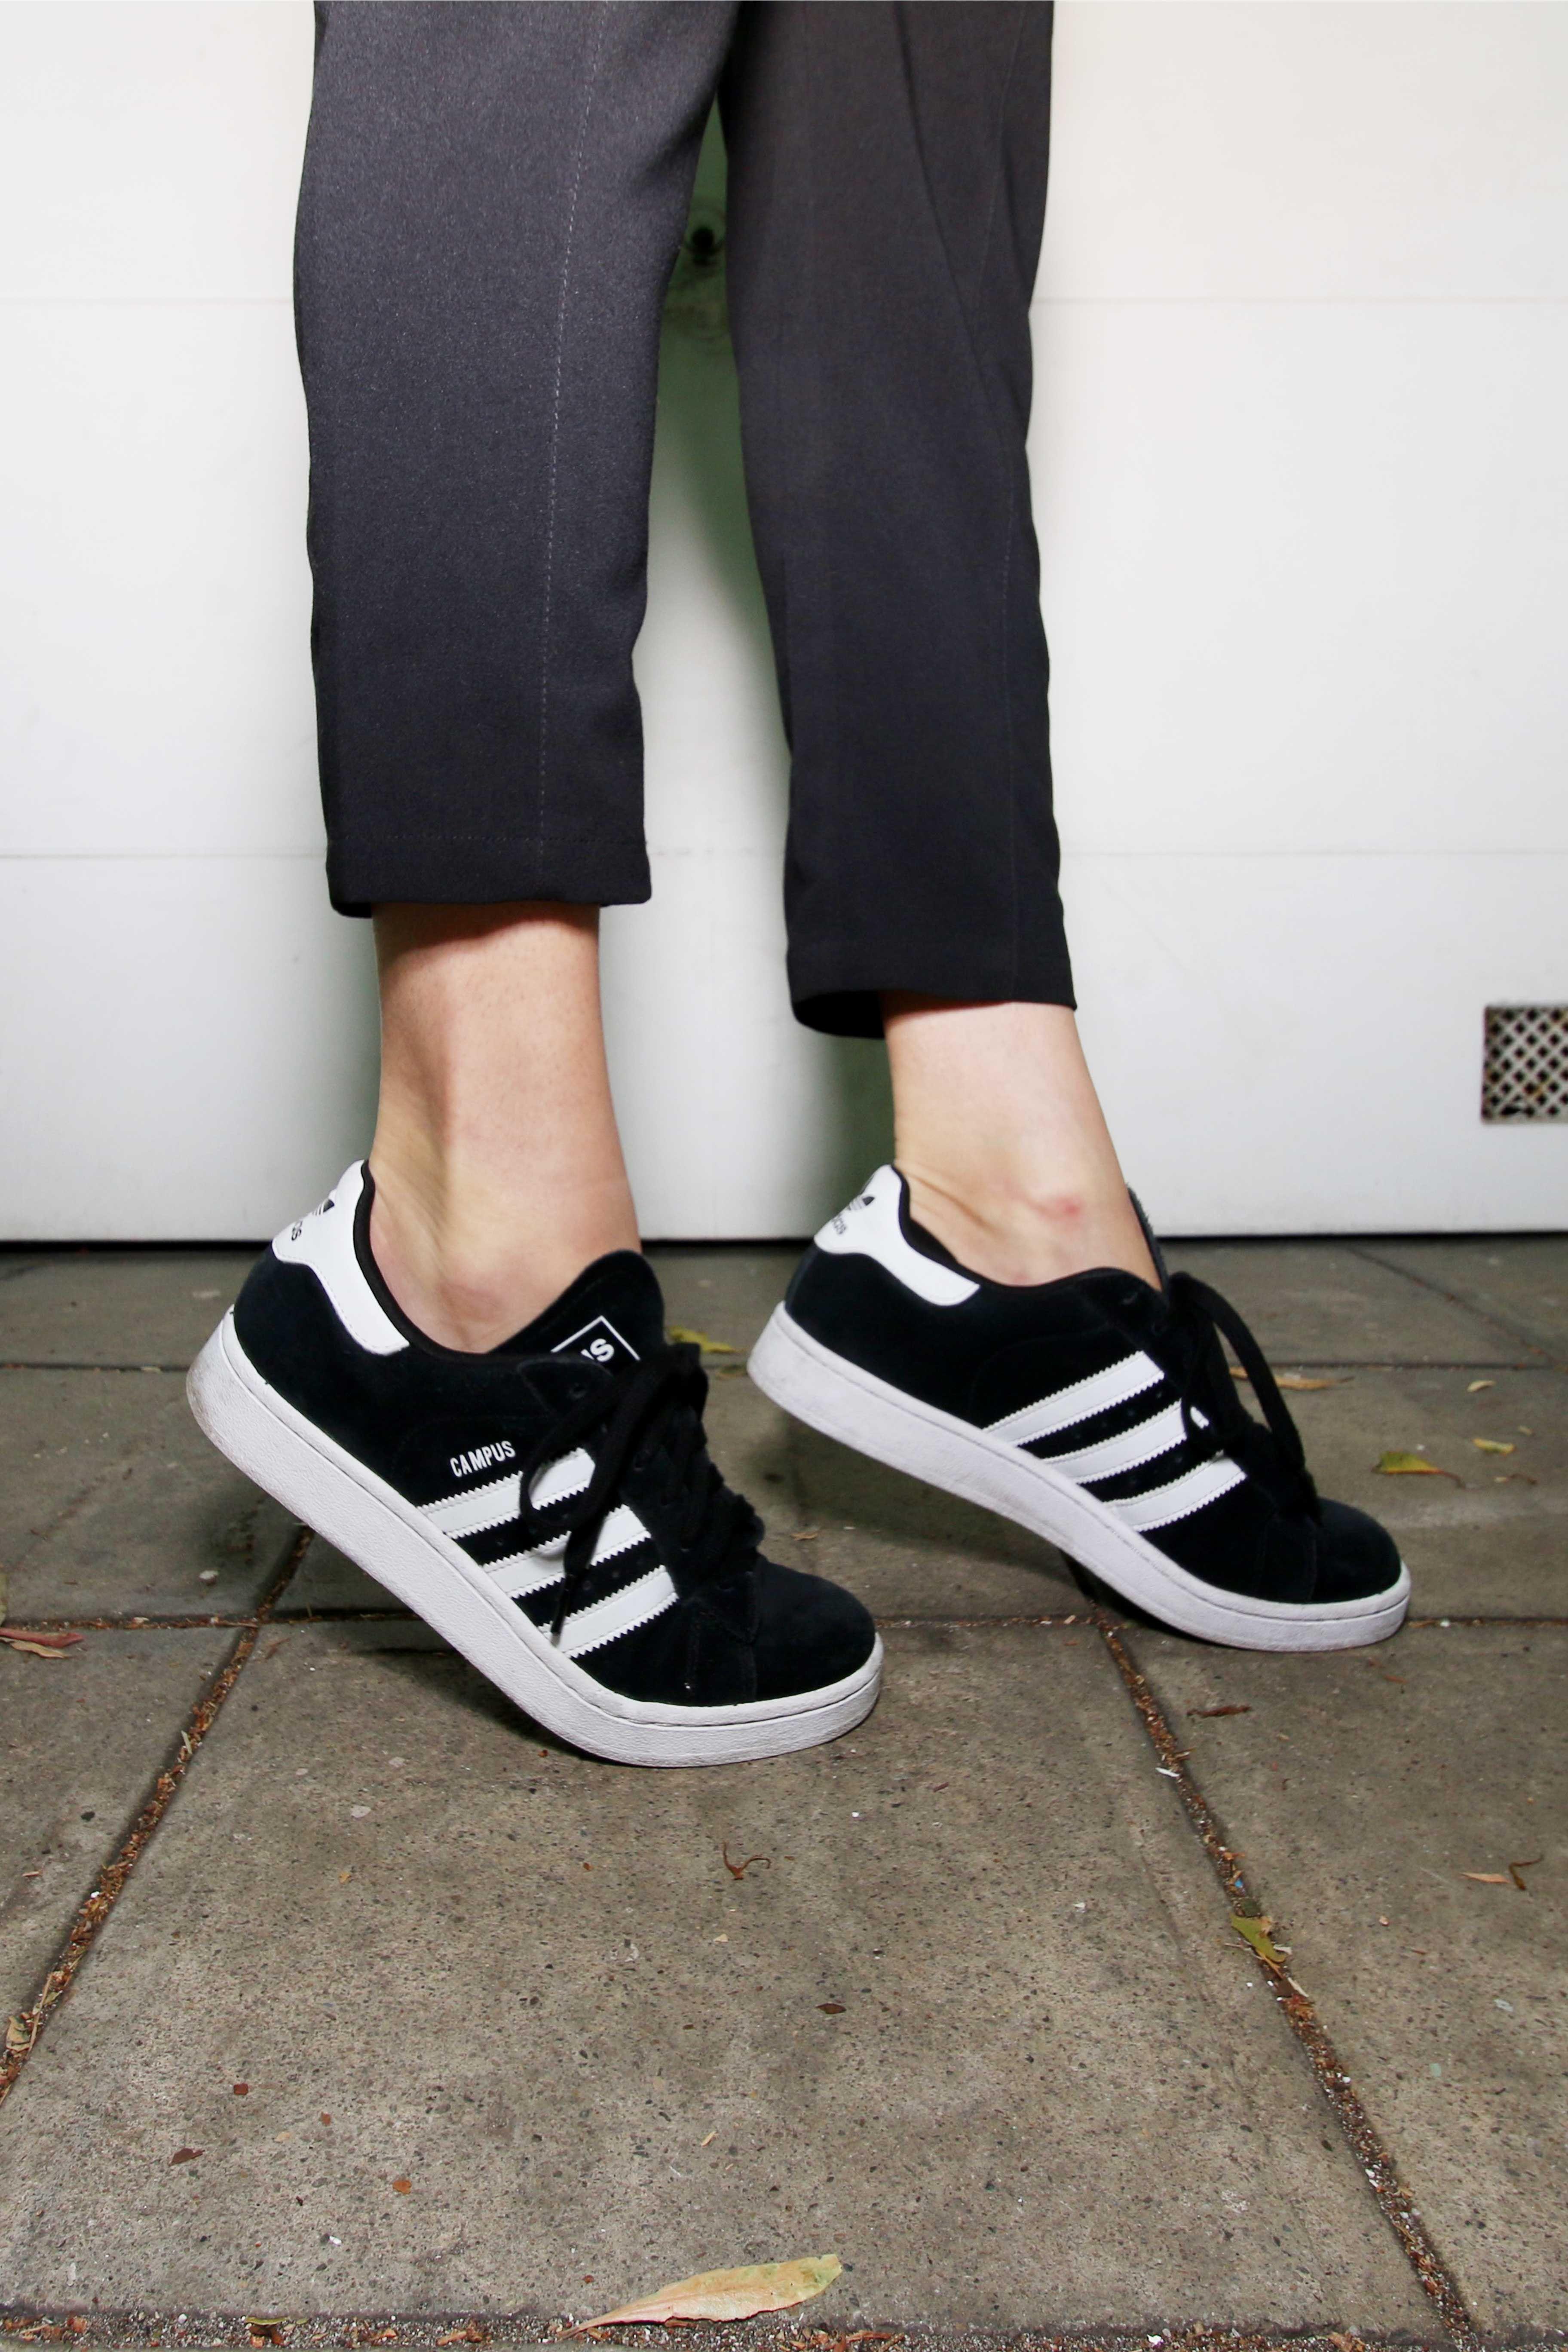 Adidas - campus, black and white | Loja